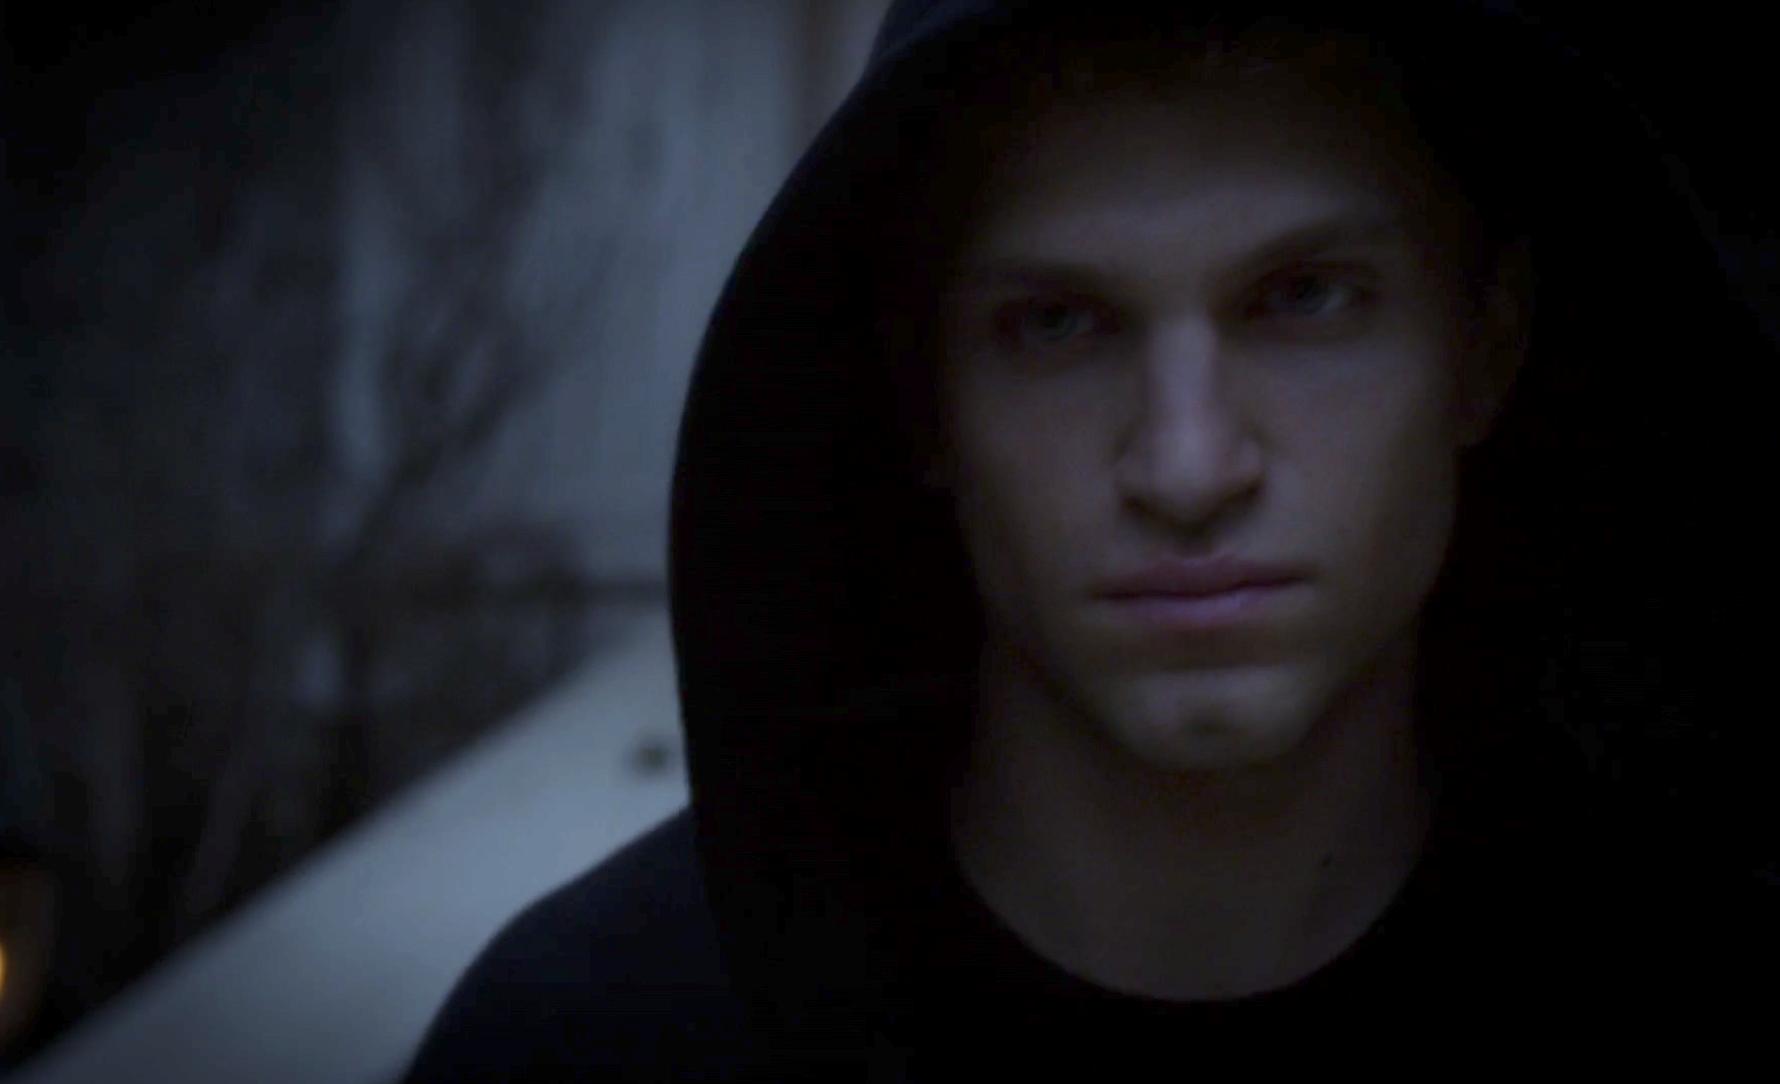 Toby in the black A hoodie